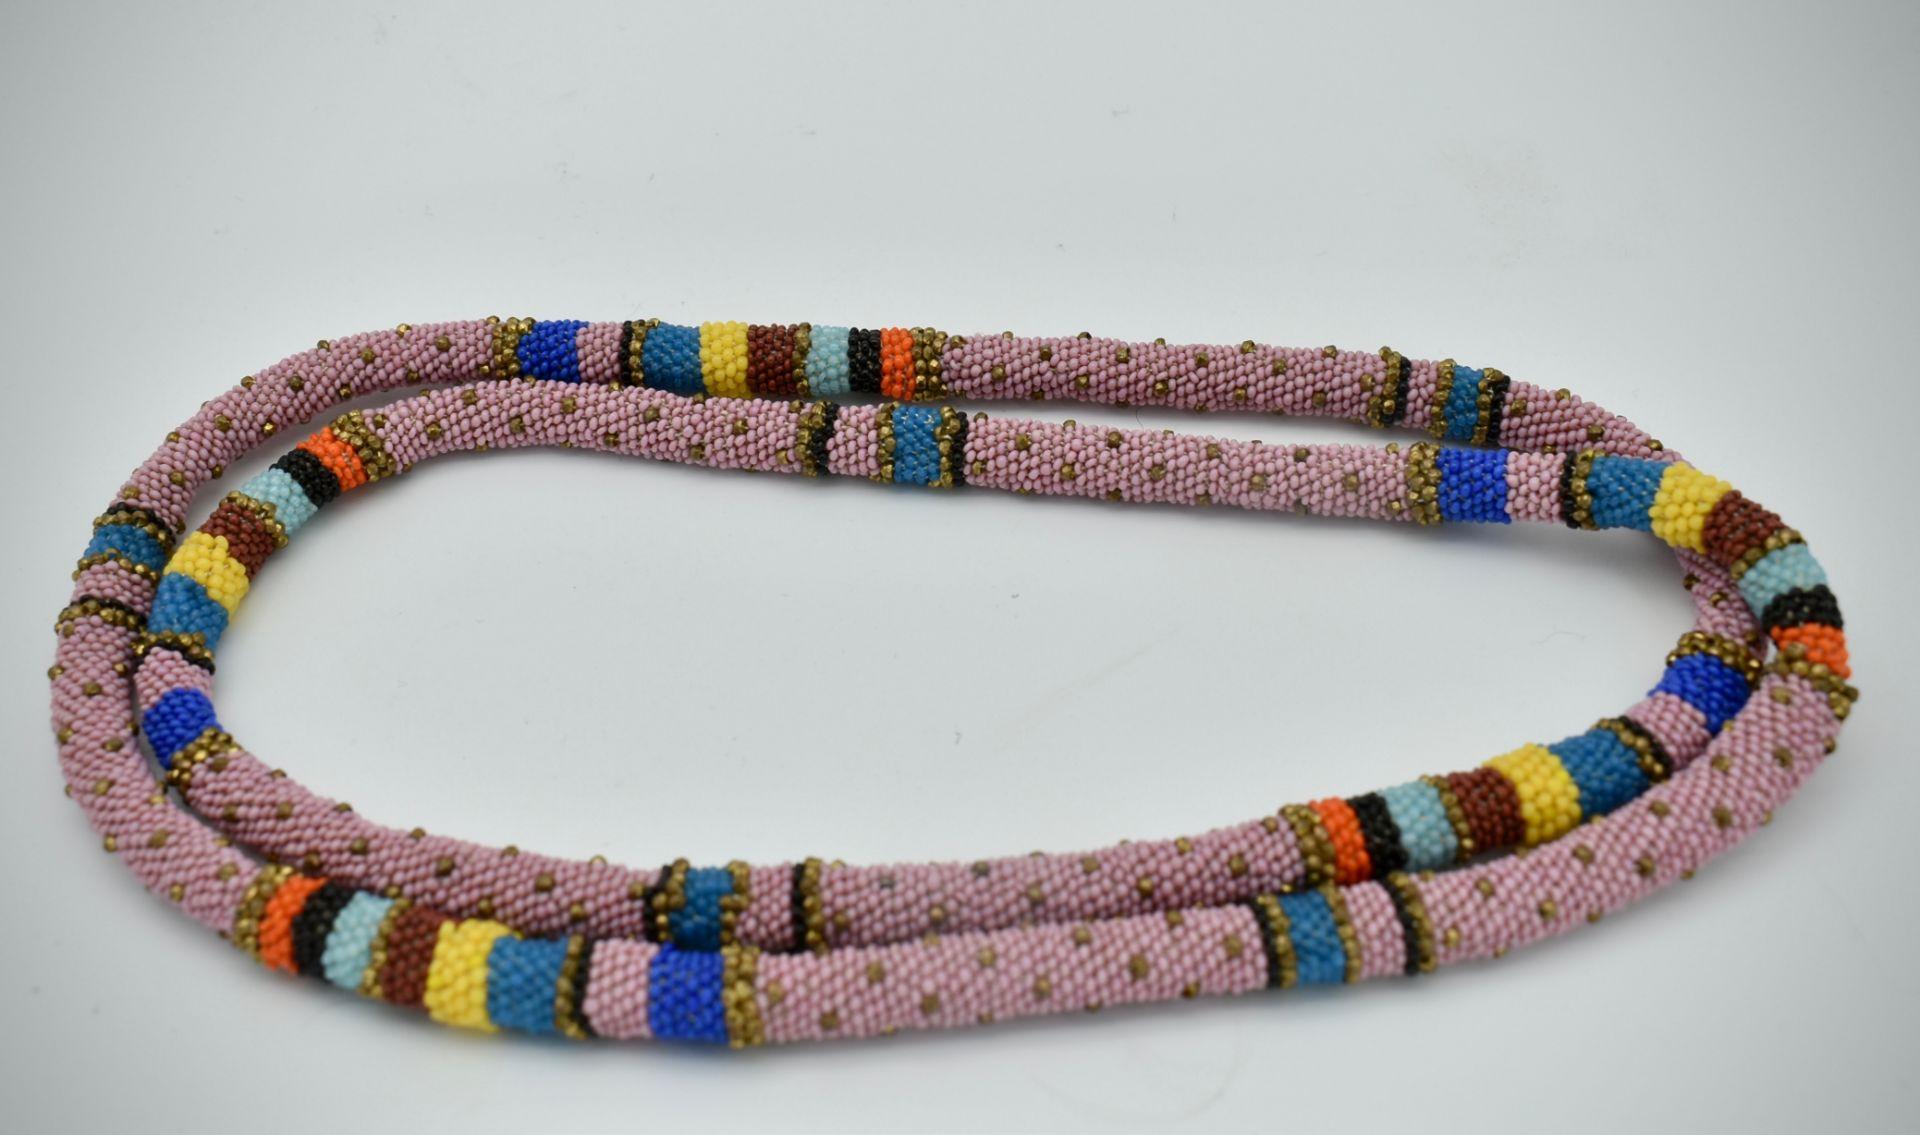 Wiener Werkstätte Micro-Beaded Necklace - Image 3 of 3